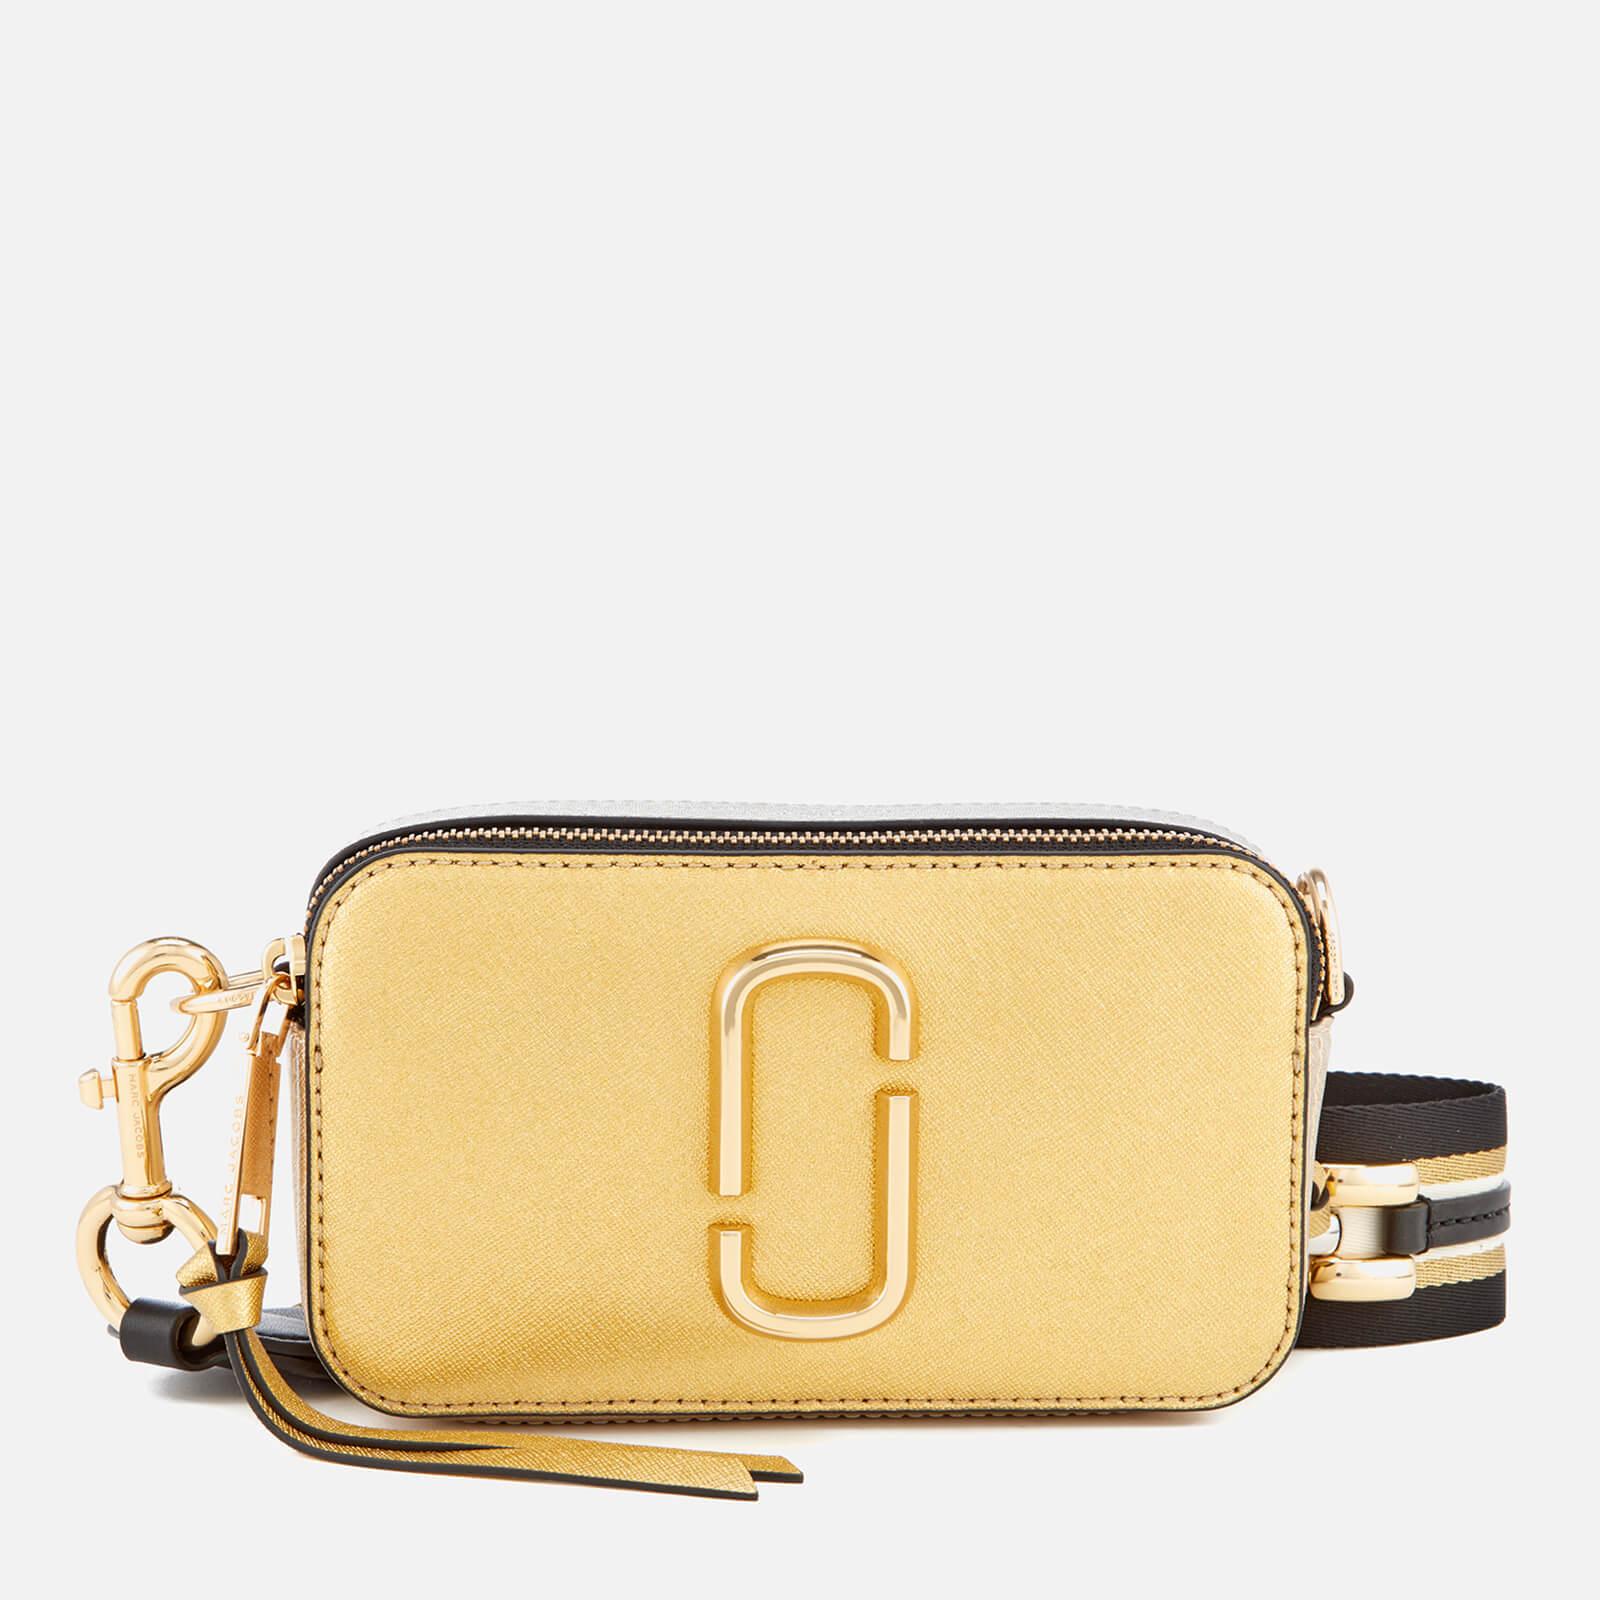 8ba28dbe9137 Marc Jacobs Women s Metallic Snapshot Bag - Gold - Free UK Delivery over £50